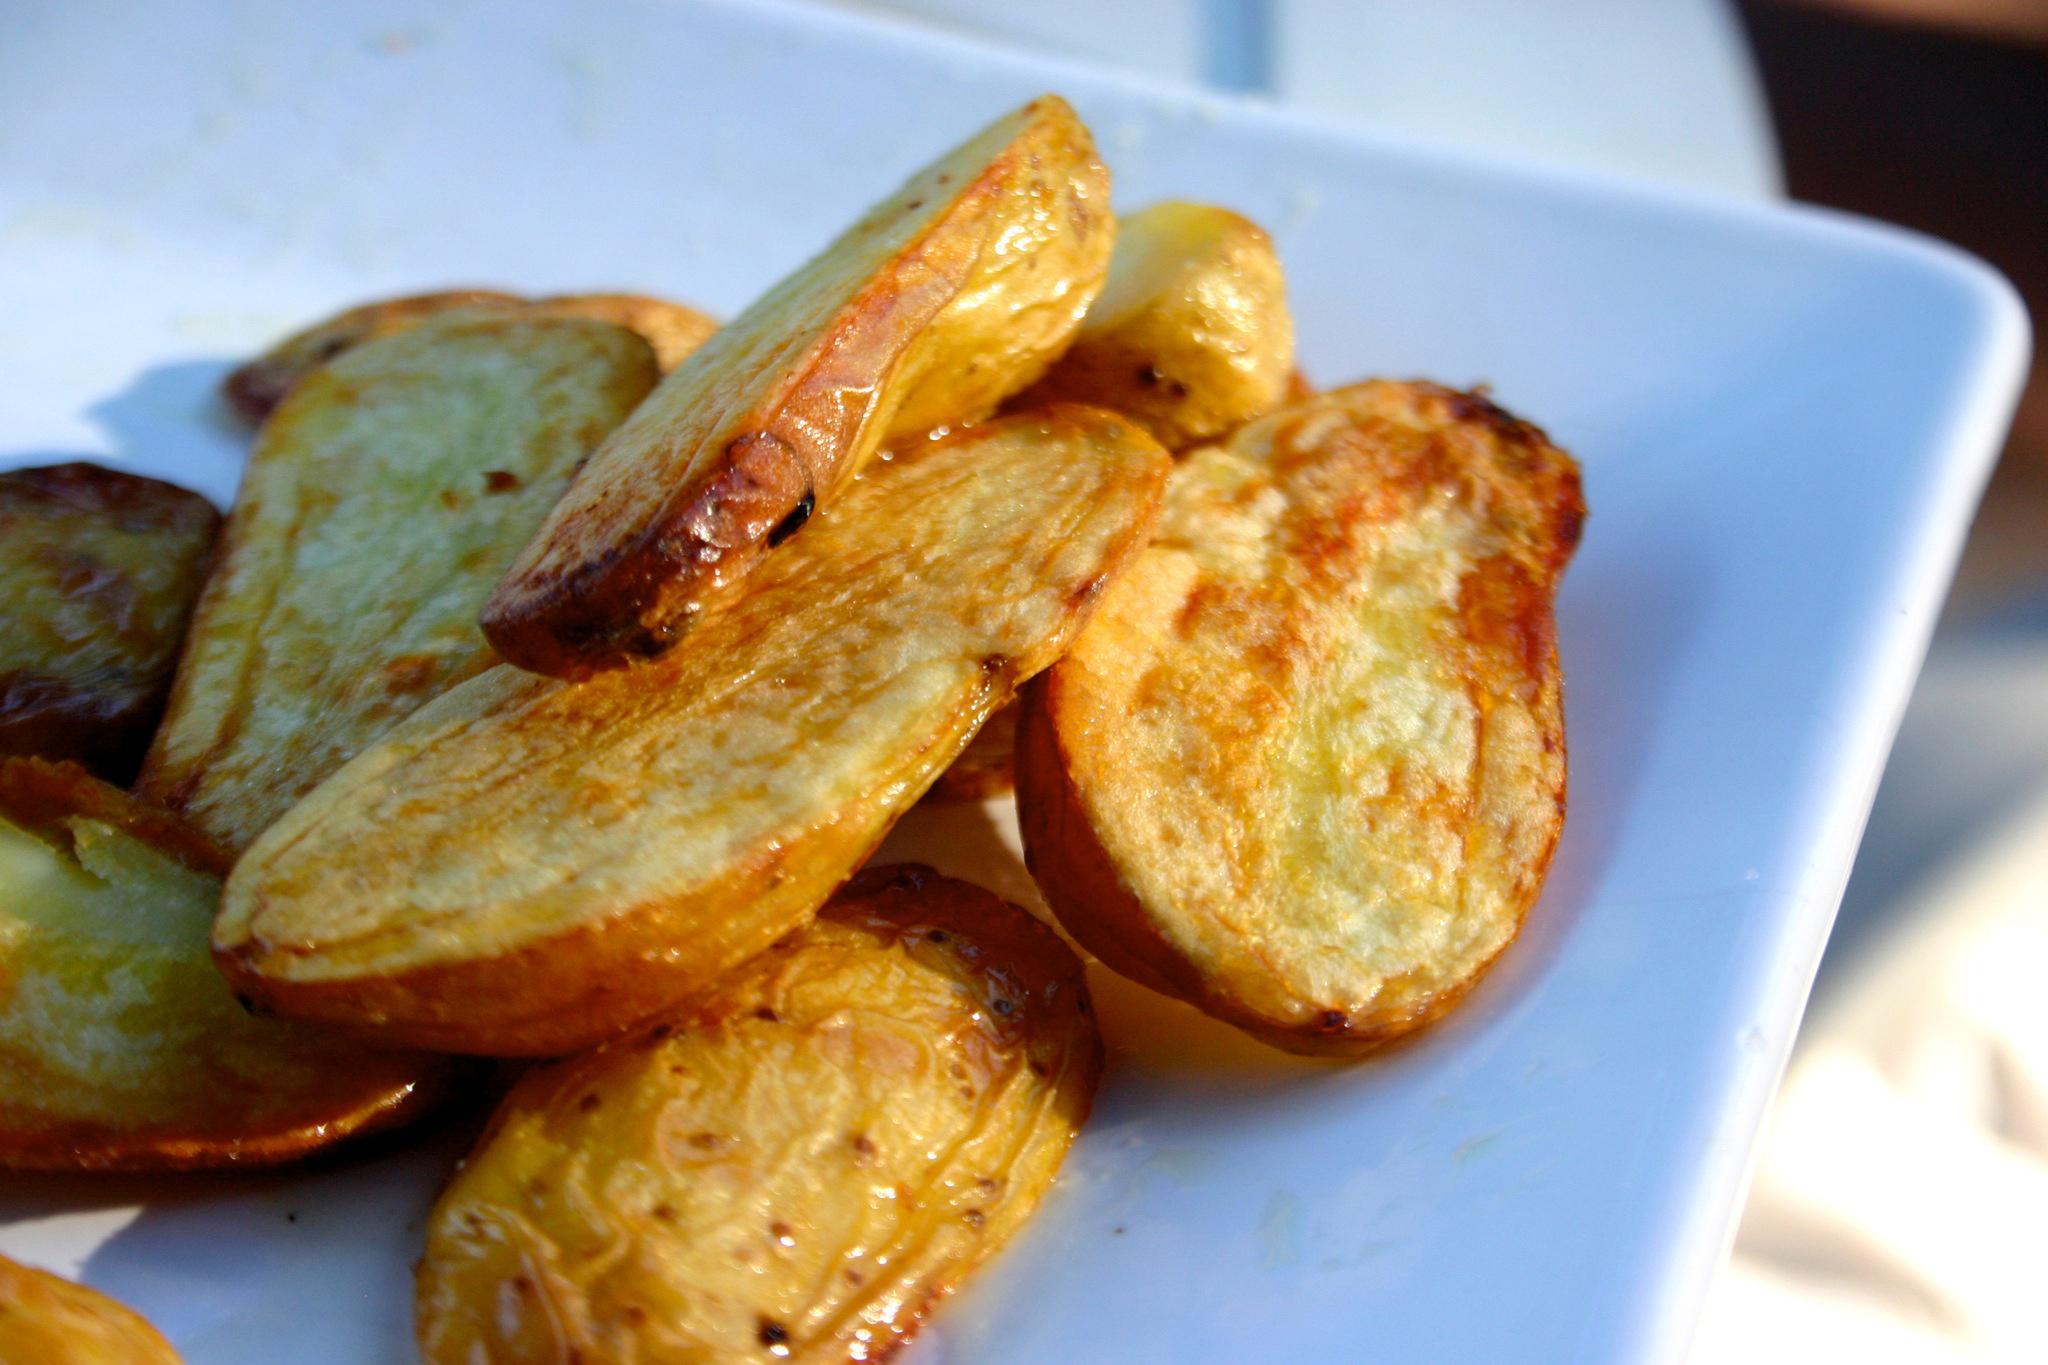 Crisp, roasted fingerling potatoes.